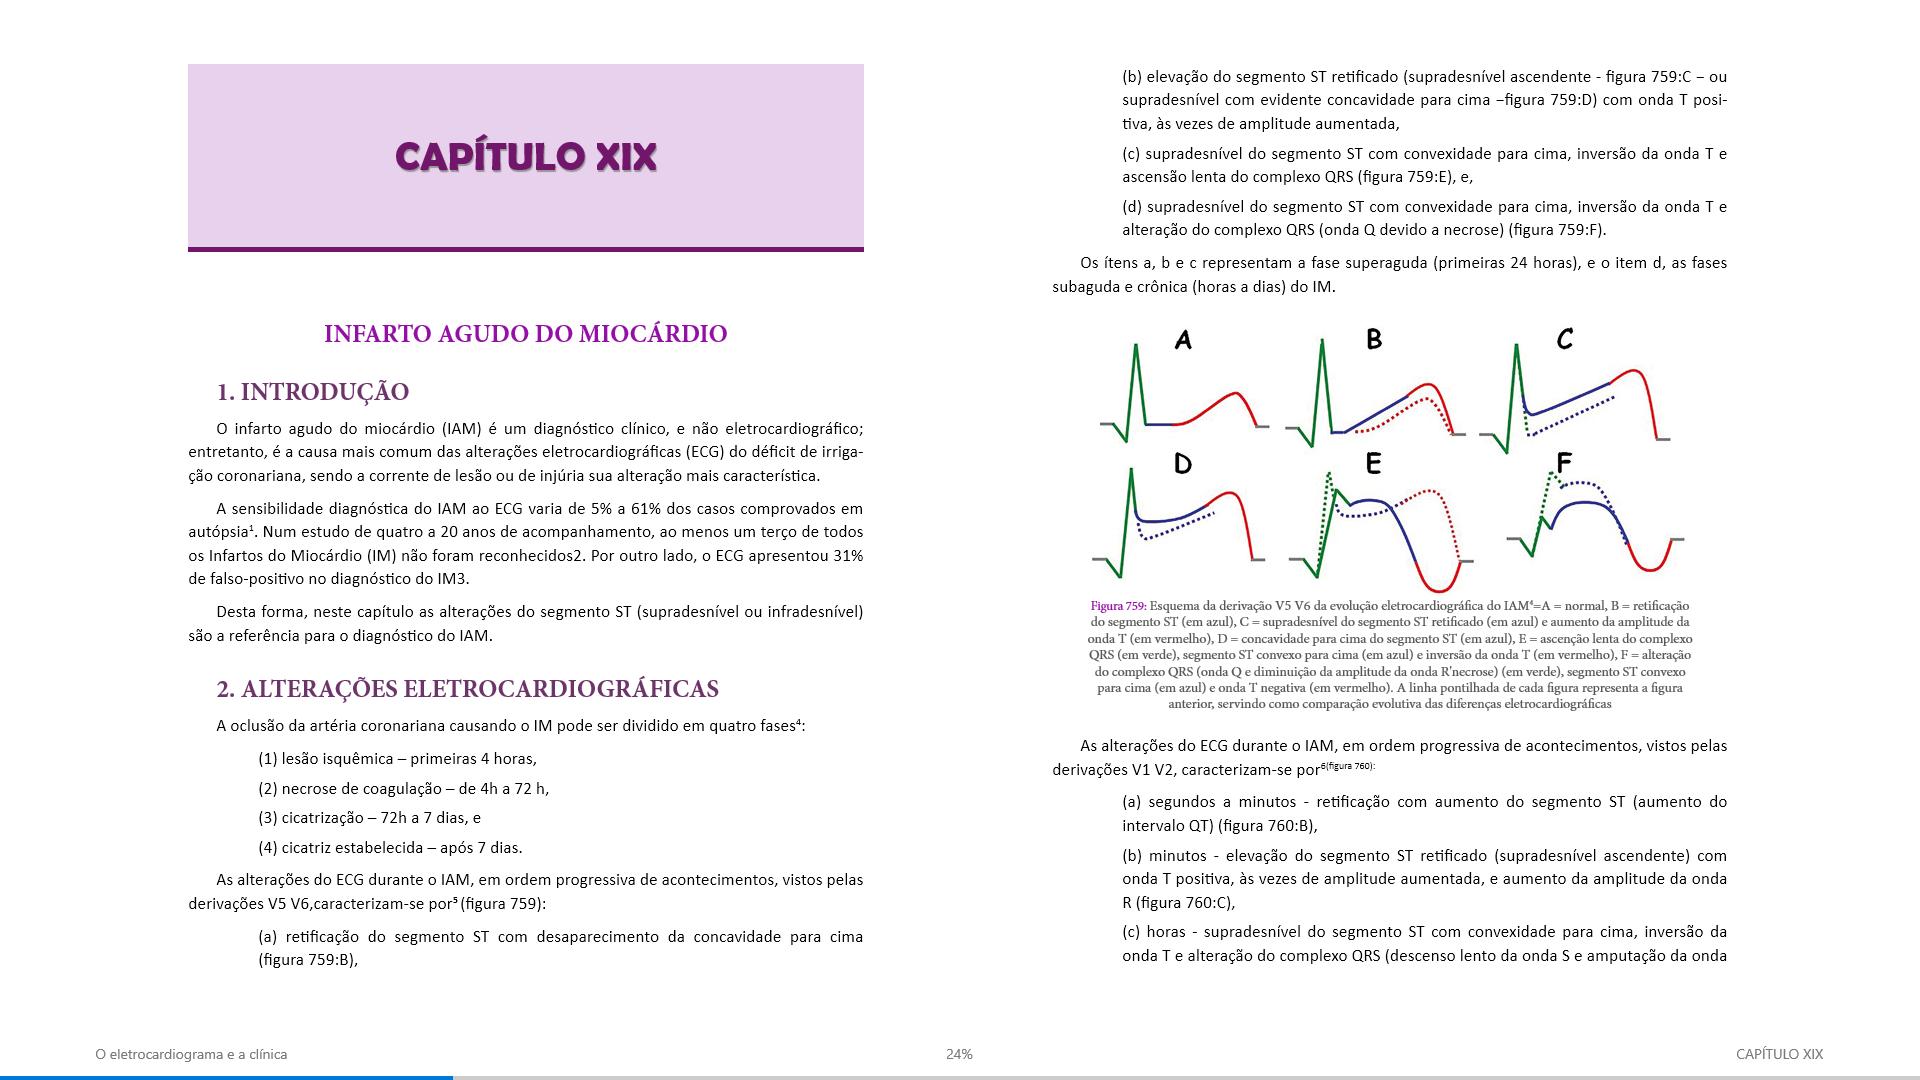 O eletrocardiograma e a clínica3 - Eduardo Machado Andréa & Bruno Rustum Andréa